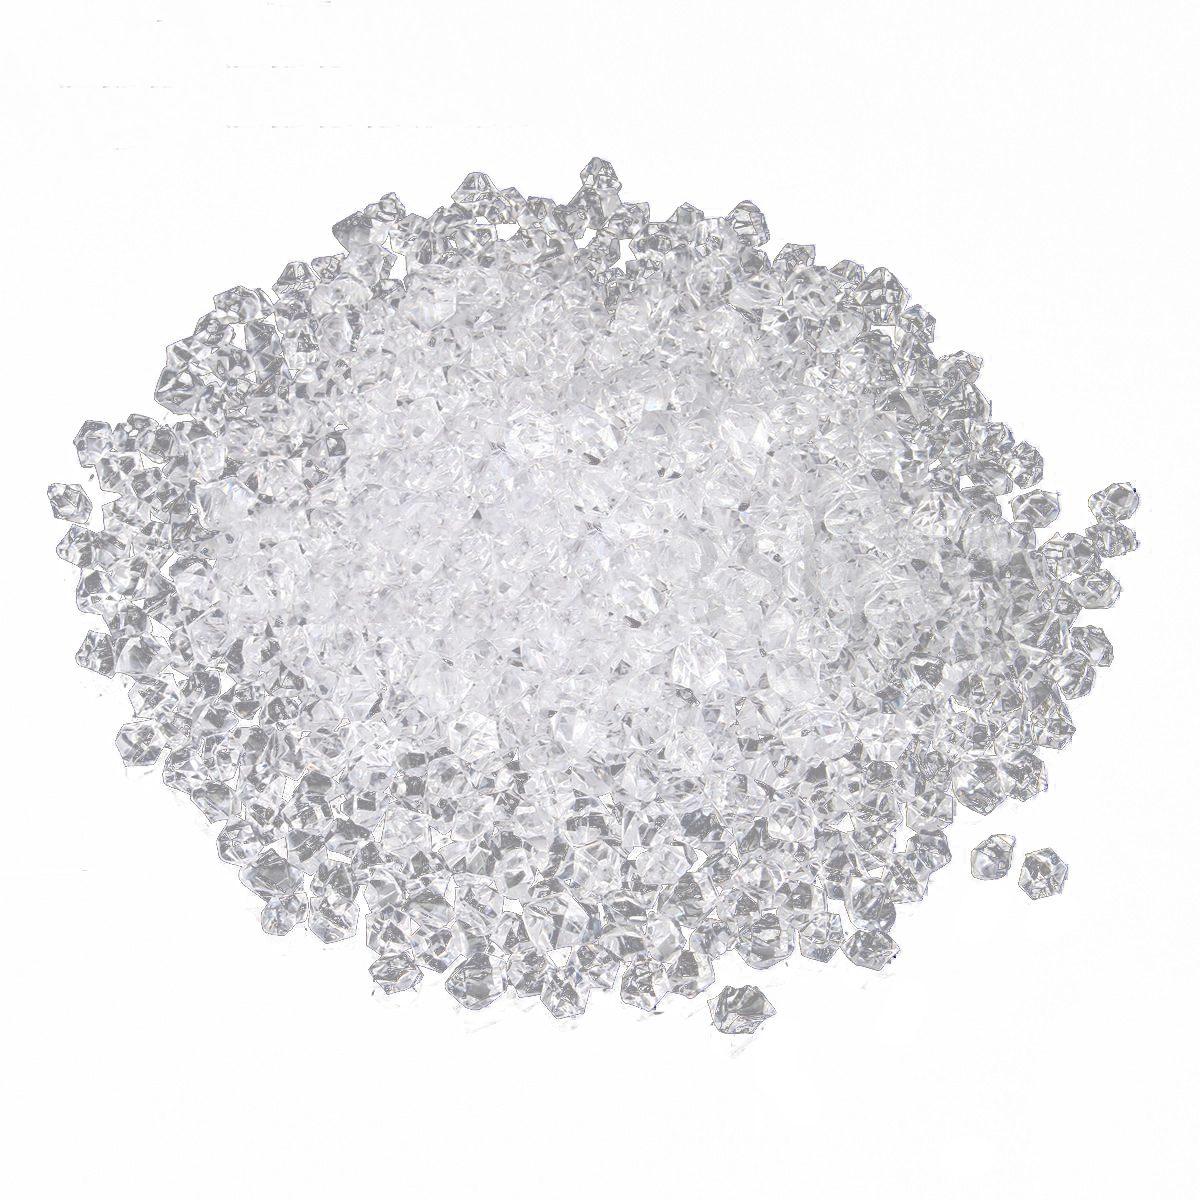 HOT SALE 1000pcs Acrylic Crystal Gem Stone ICE Rocks Table Scatter Vase Decoration New, 1000Pcs 14Mm